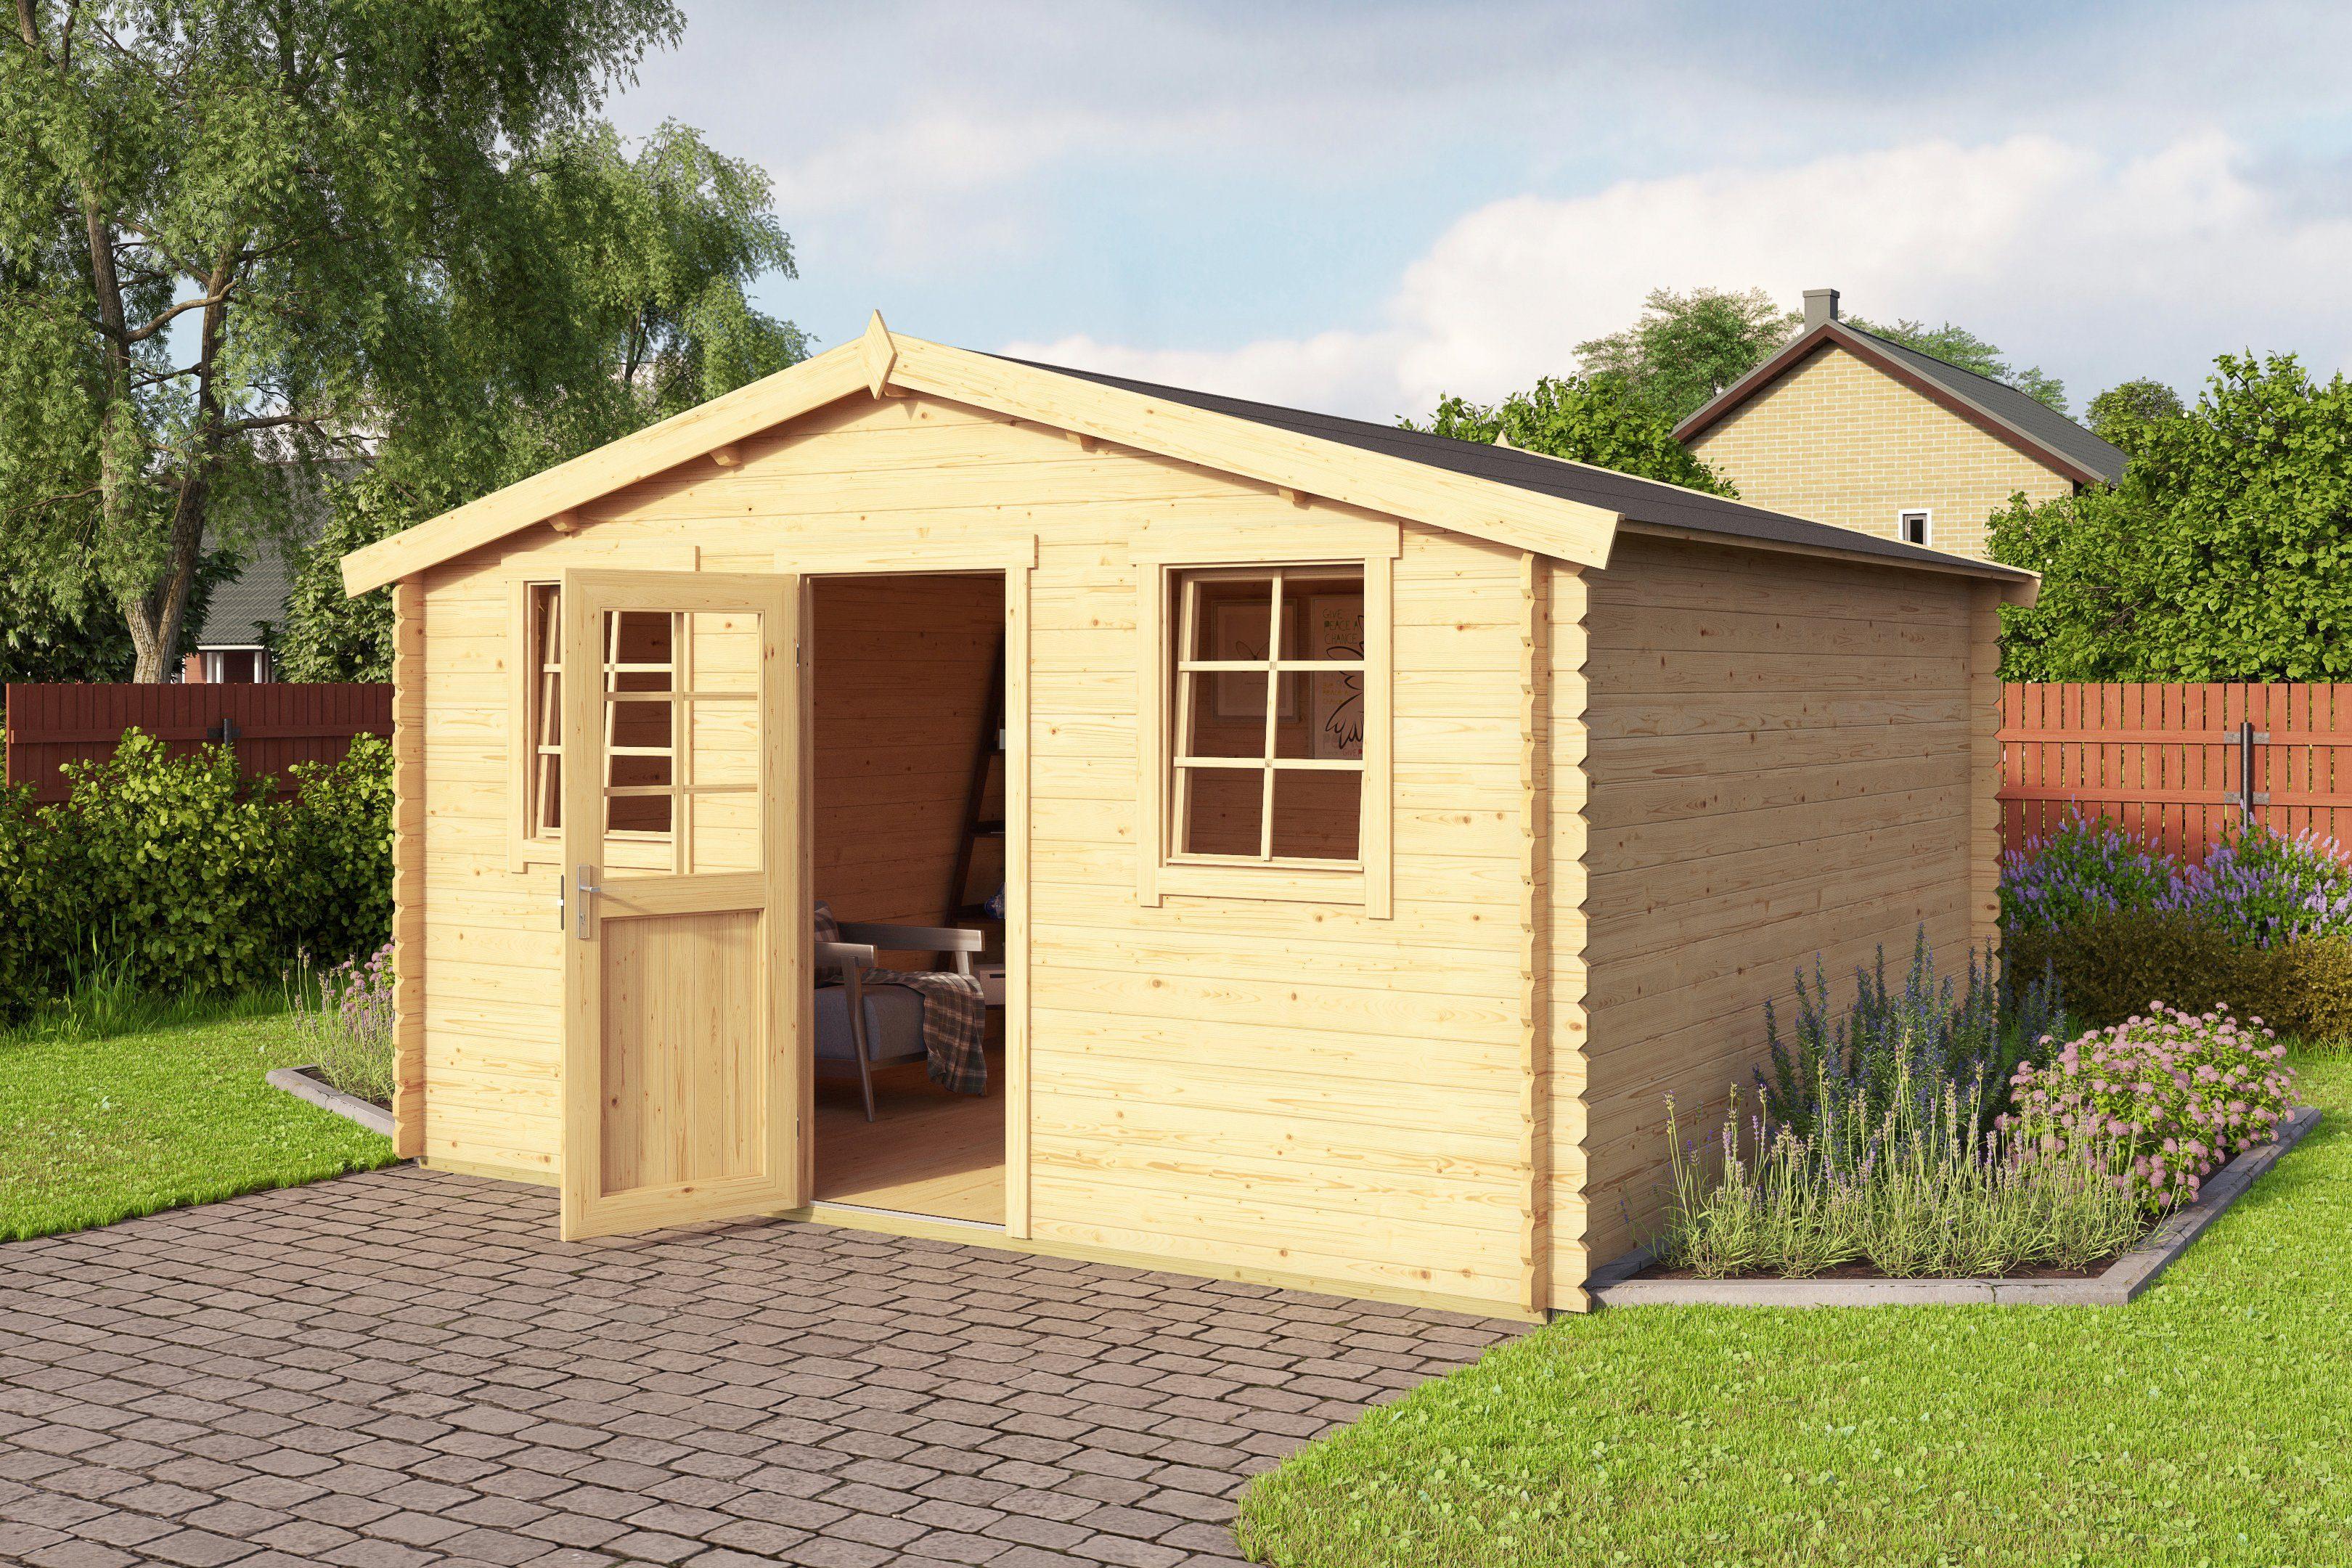 OUTDOOR LIFE PRODUCTS Gartenhaus »Mosel 4 ET«, BxT: 410x410 cm, 28 mm